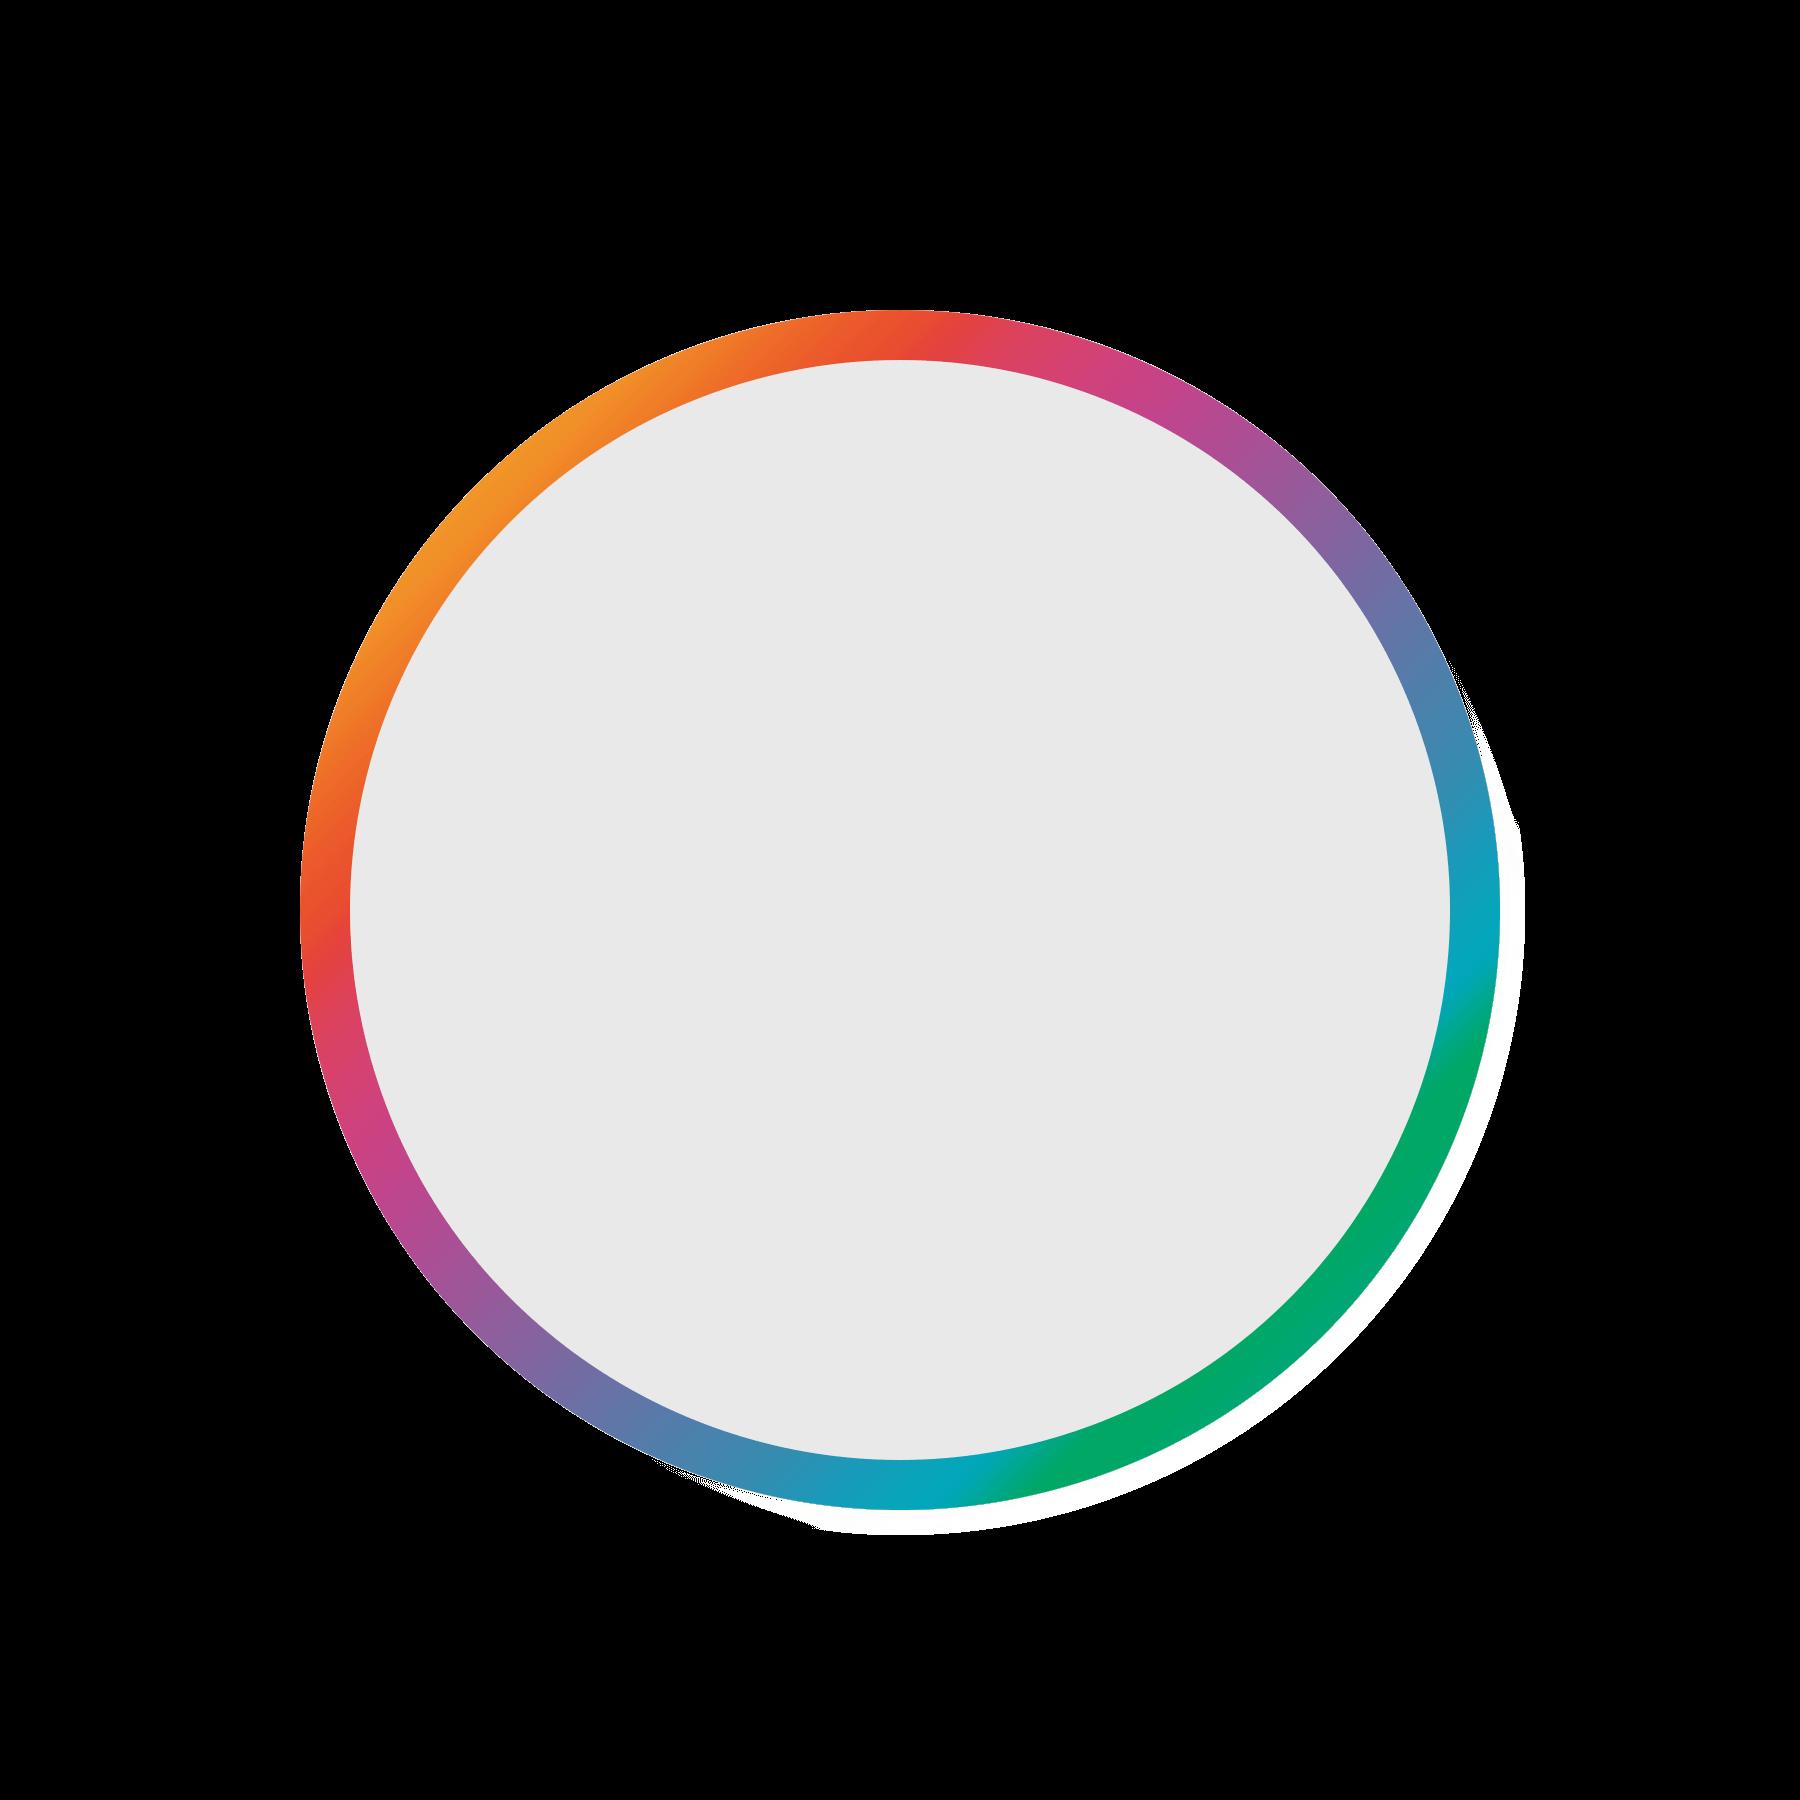 XMG SECTOR White - Intel